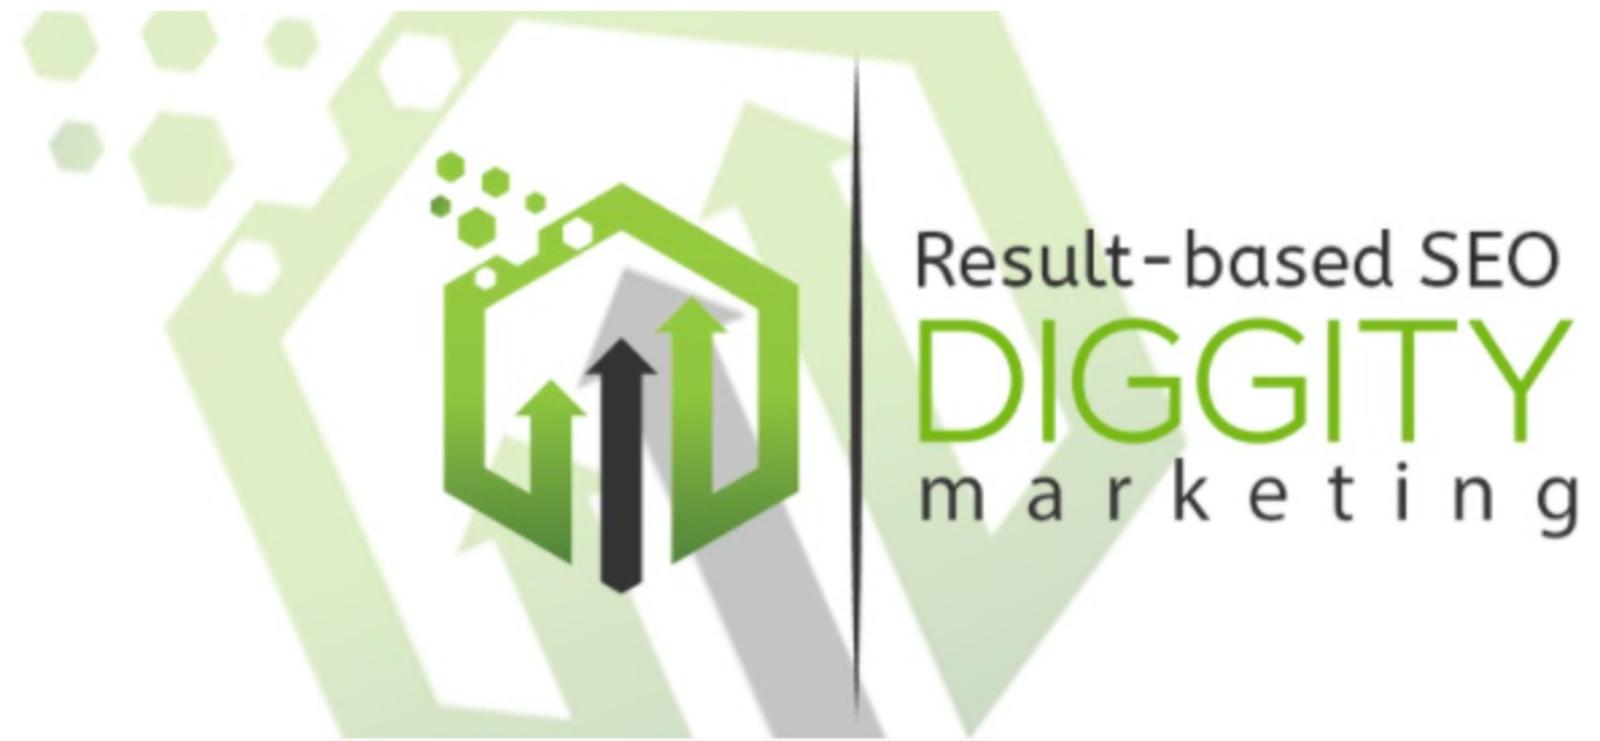 Results based SEO Diggity Marketing